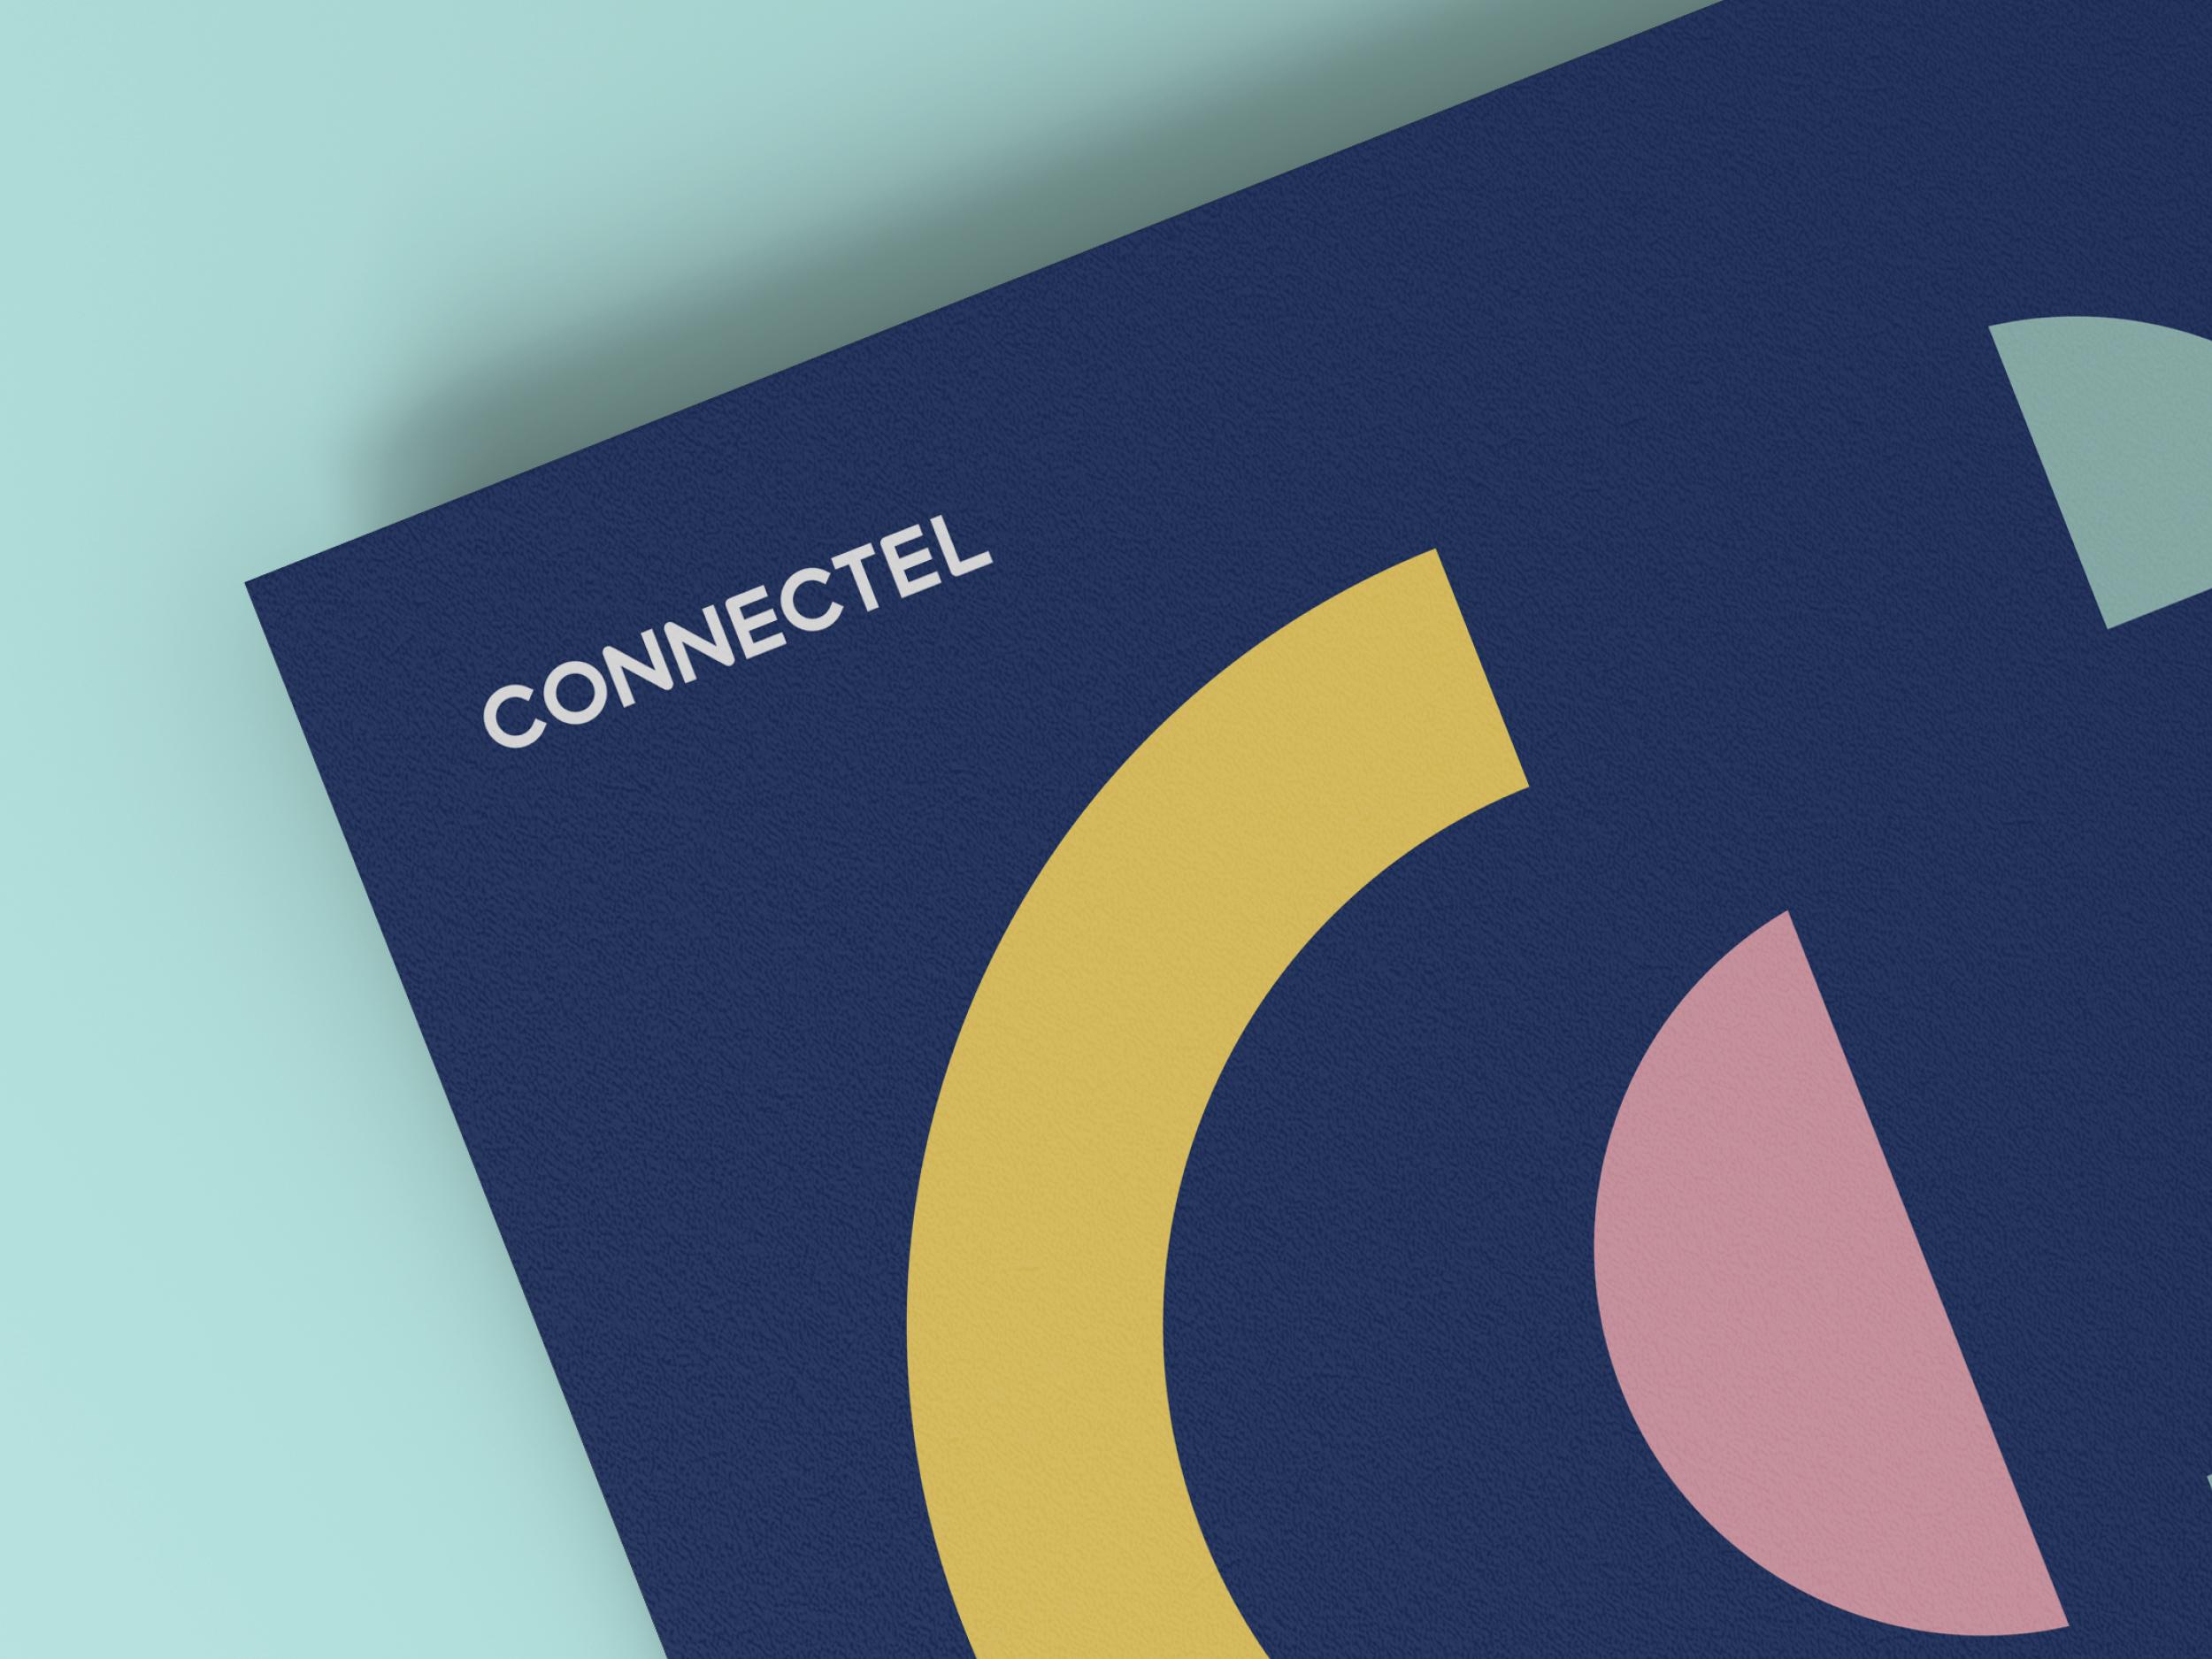 Connectel_Case2.jpg